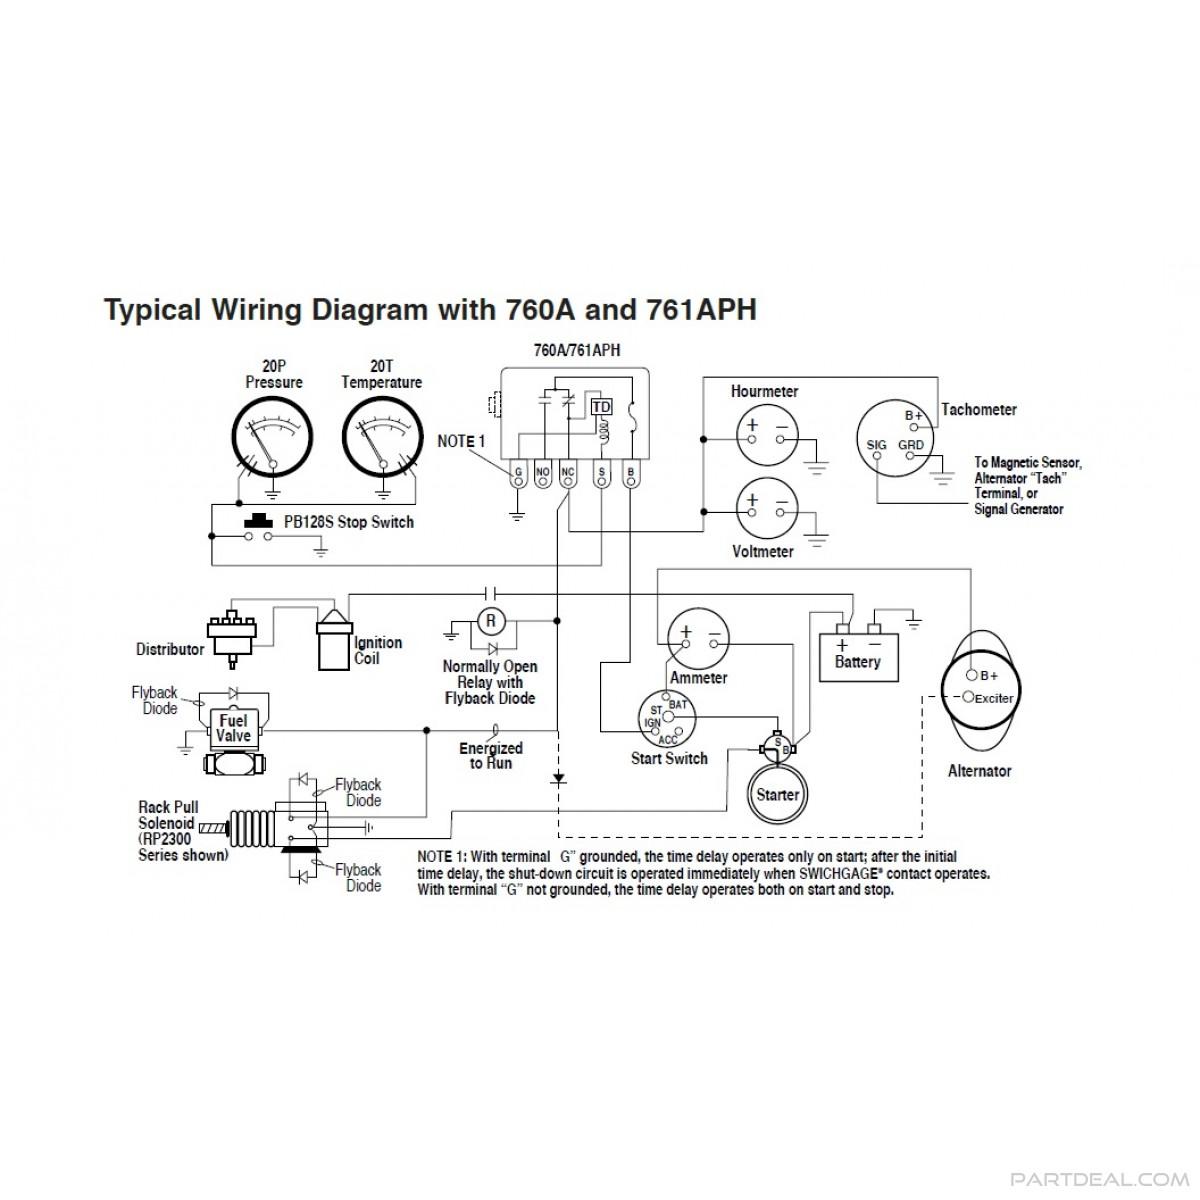 Bm 0876 221 Murphy Switch Wiring Diagram Free Diagram